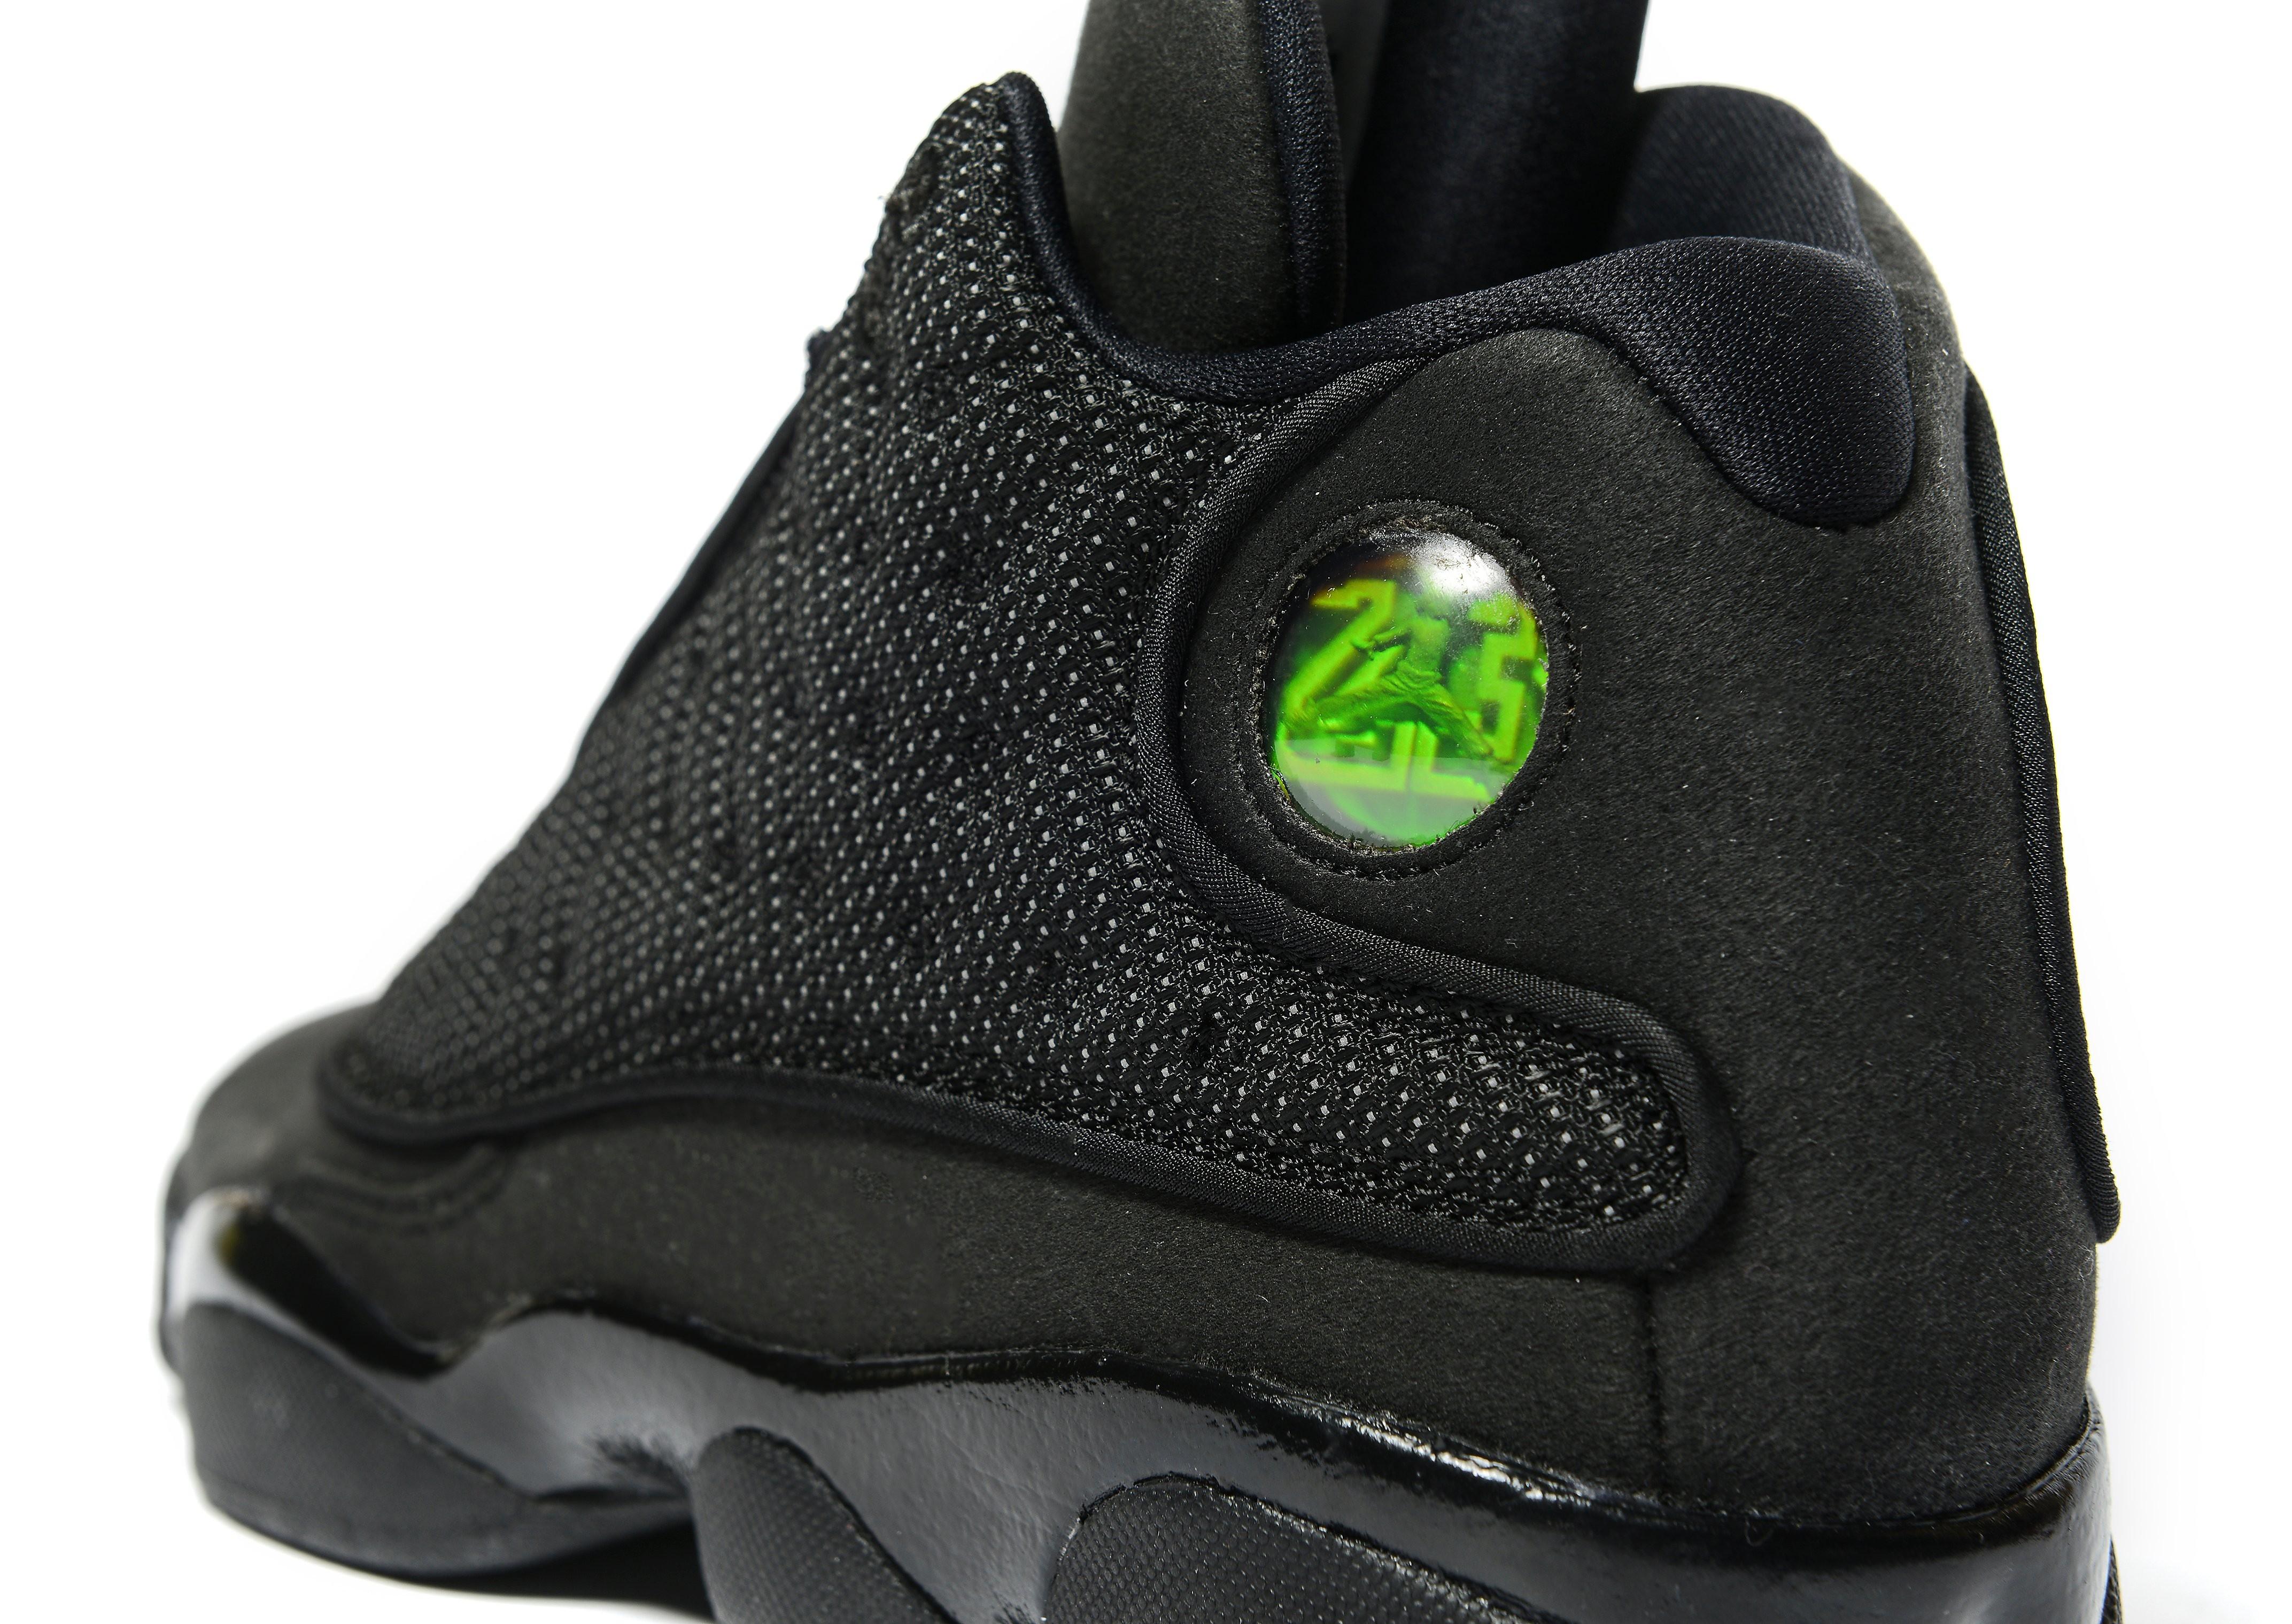 Jordan Retro 13 BG 'Black Cat'